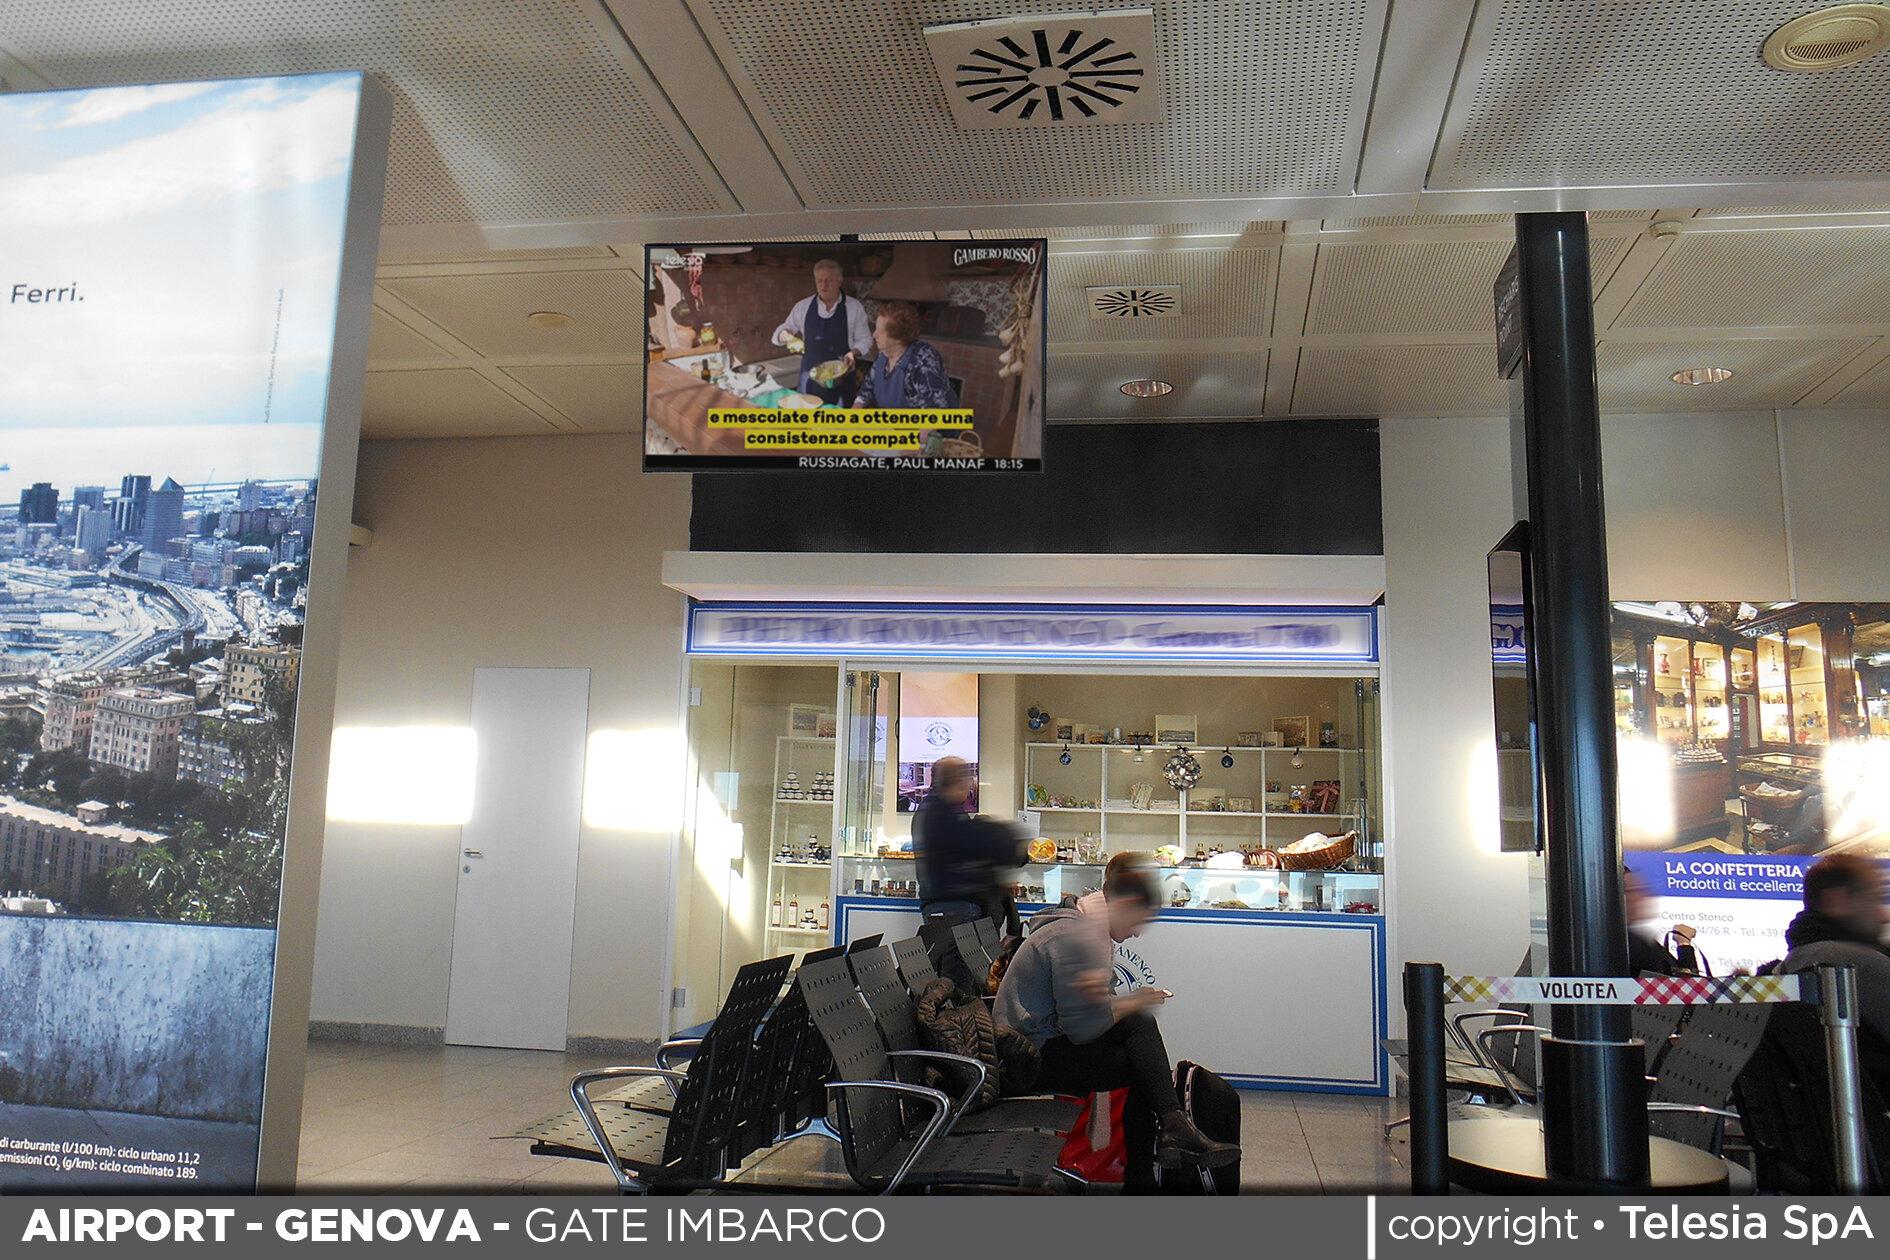 T_airportGenova1.jpg